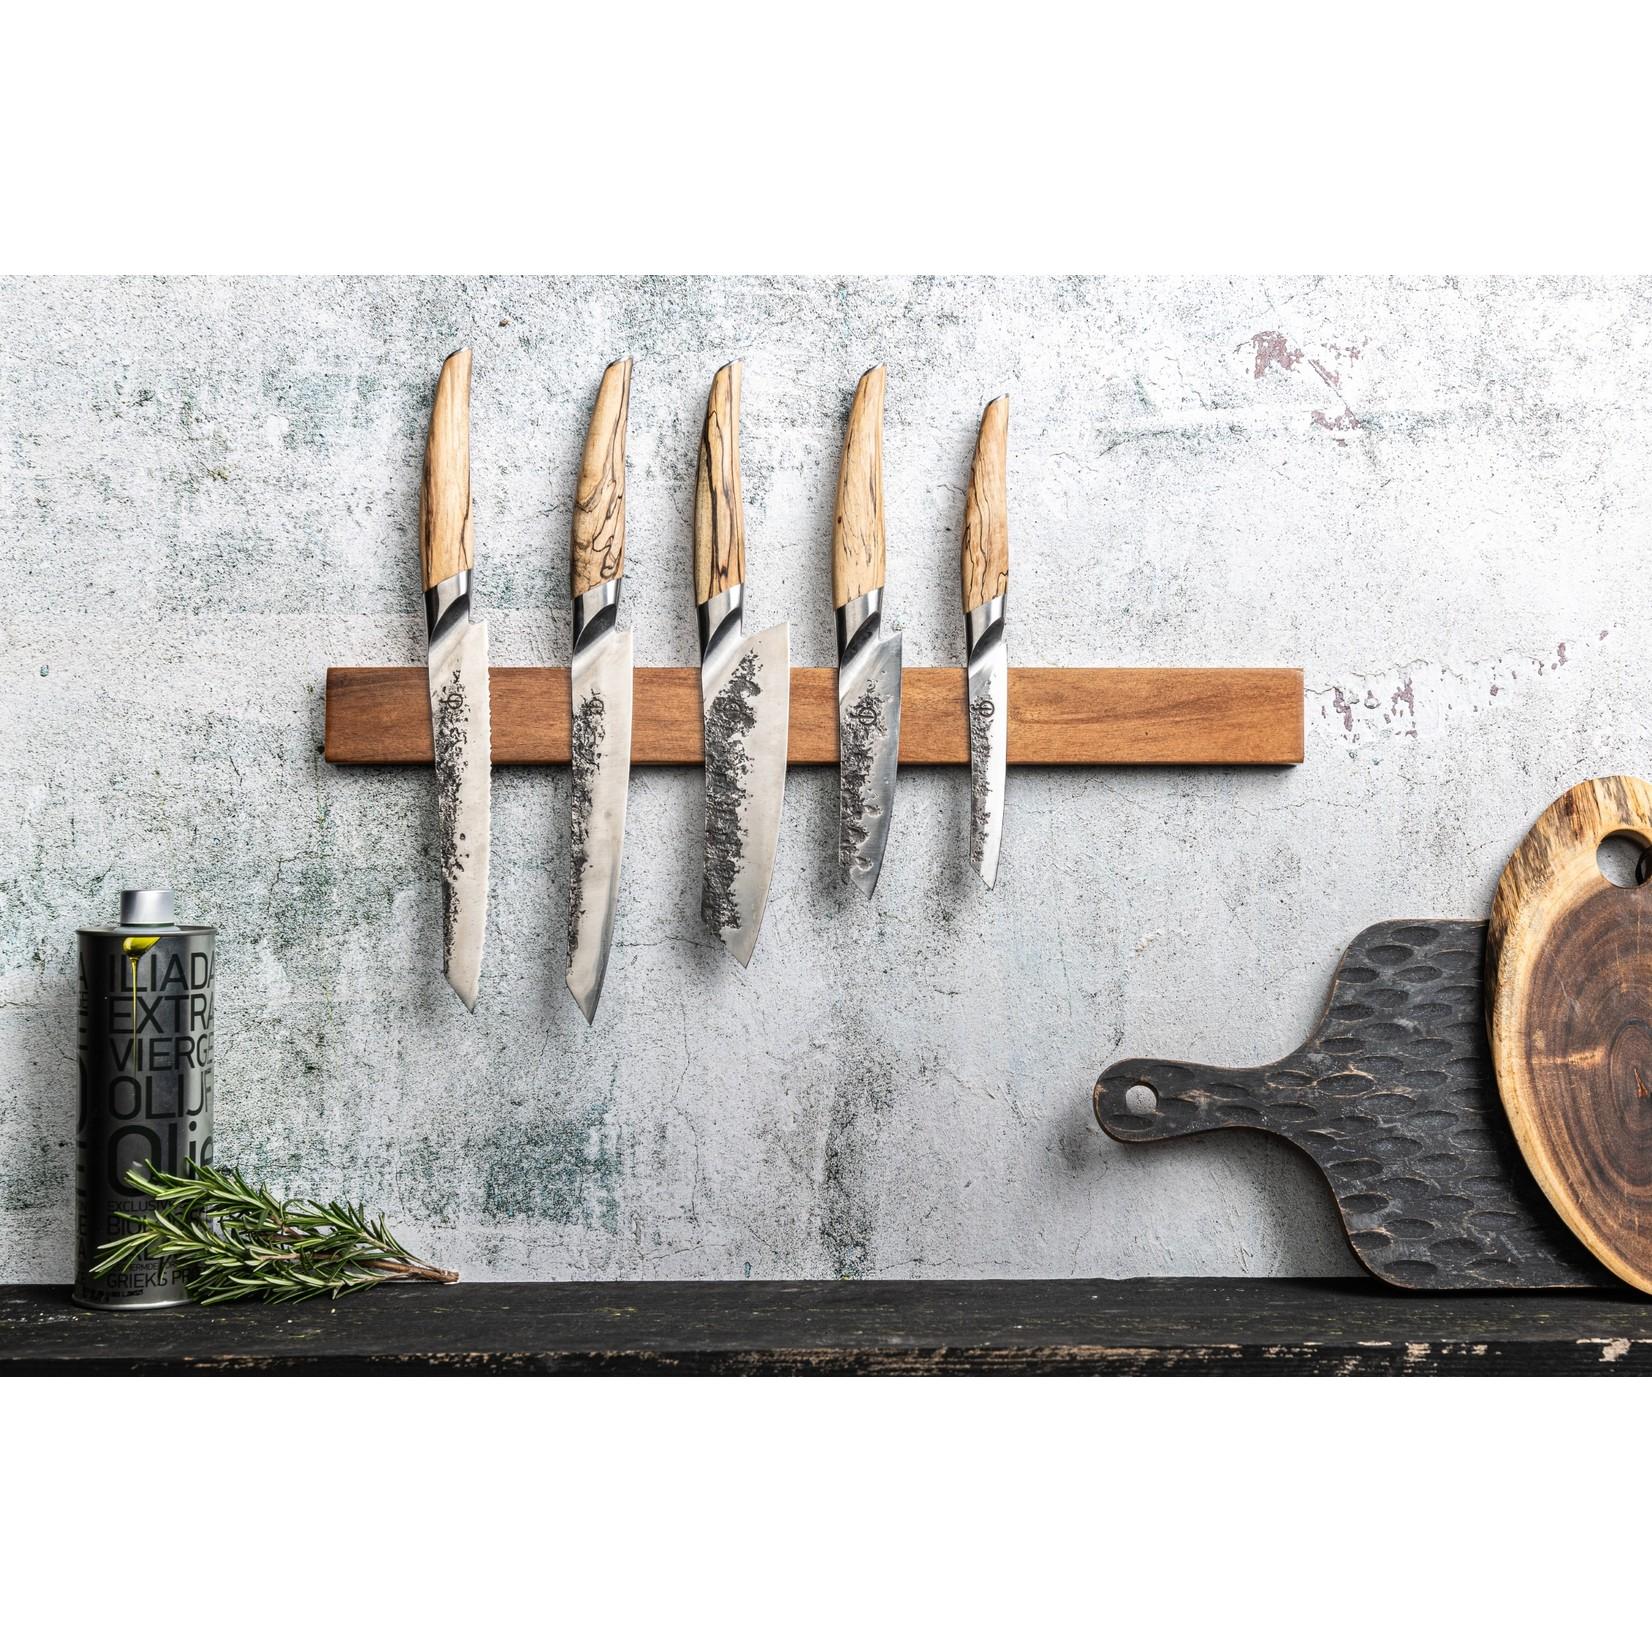 Forged Forged Katai universeel keukenmes 12cm